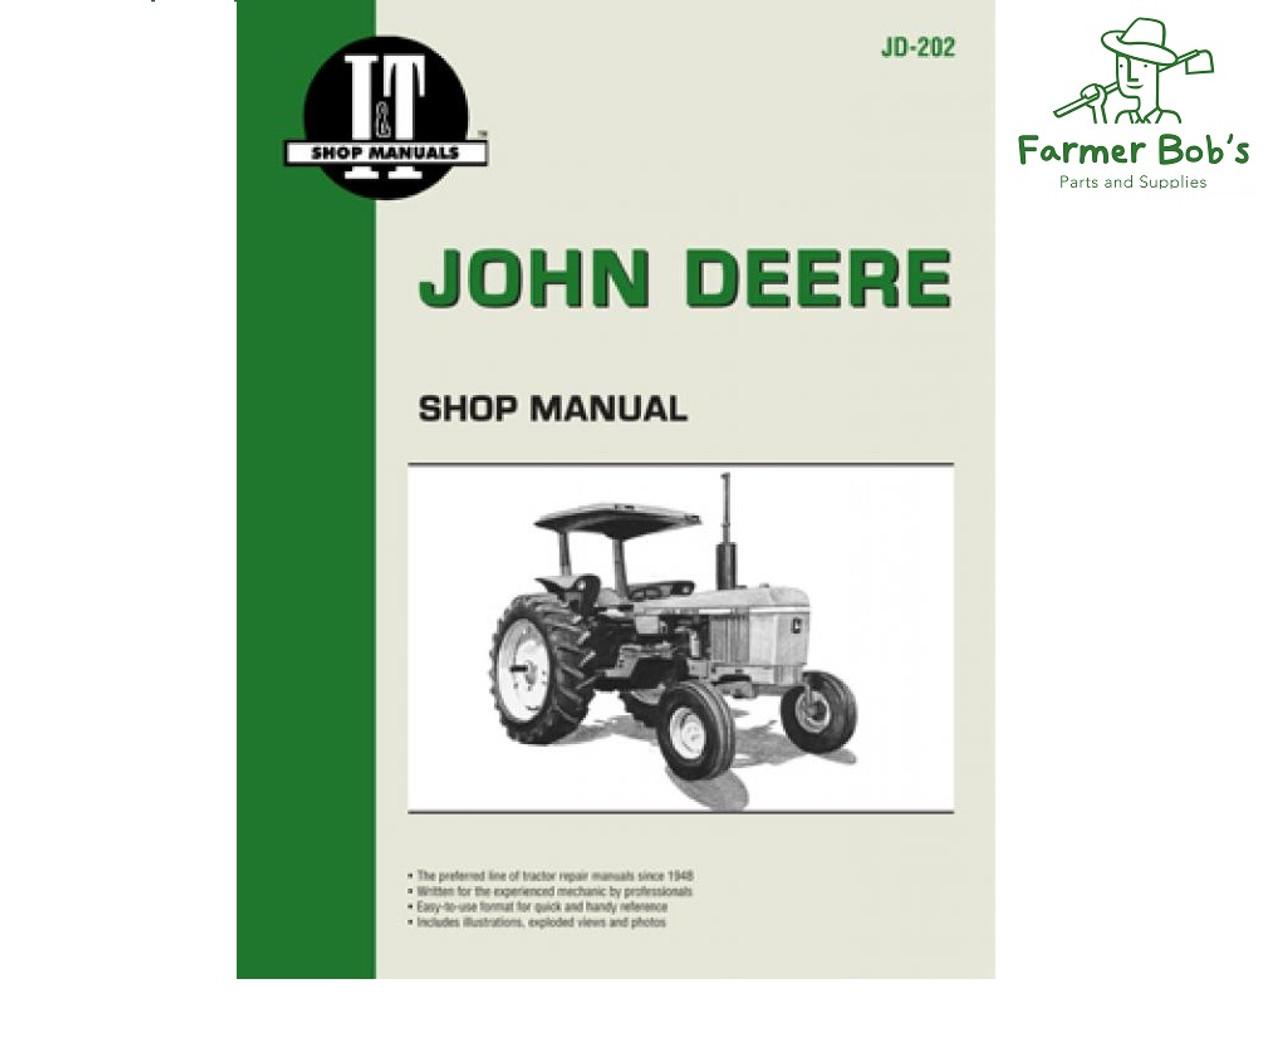 hight resolution of jd202 i u0026t shop manuals john deere 2510 2520 2040 2240